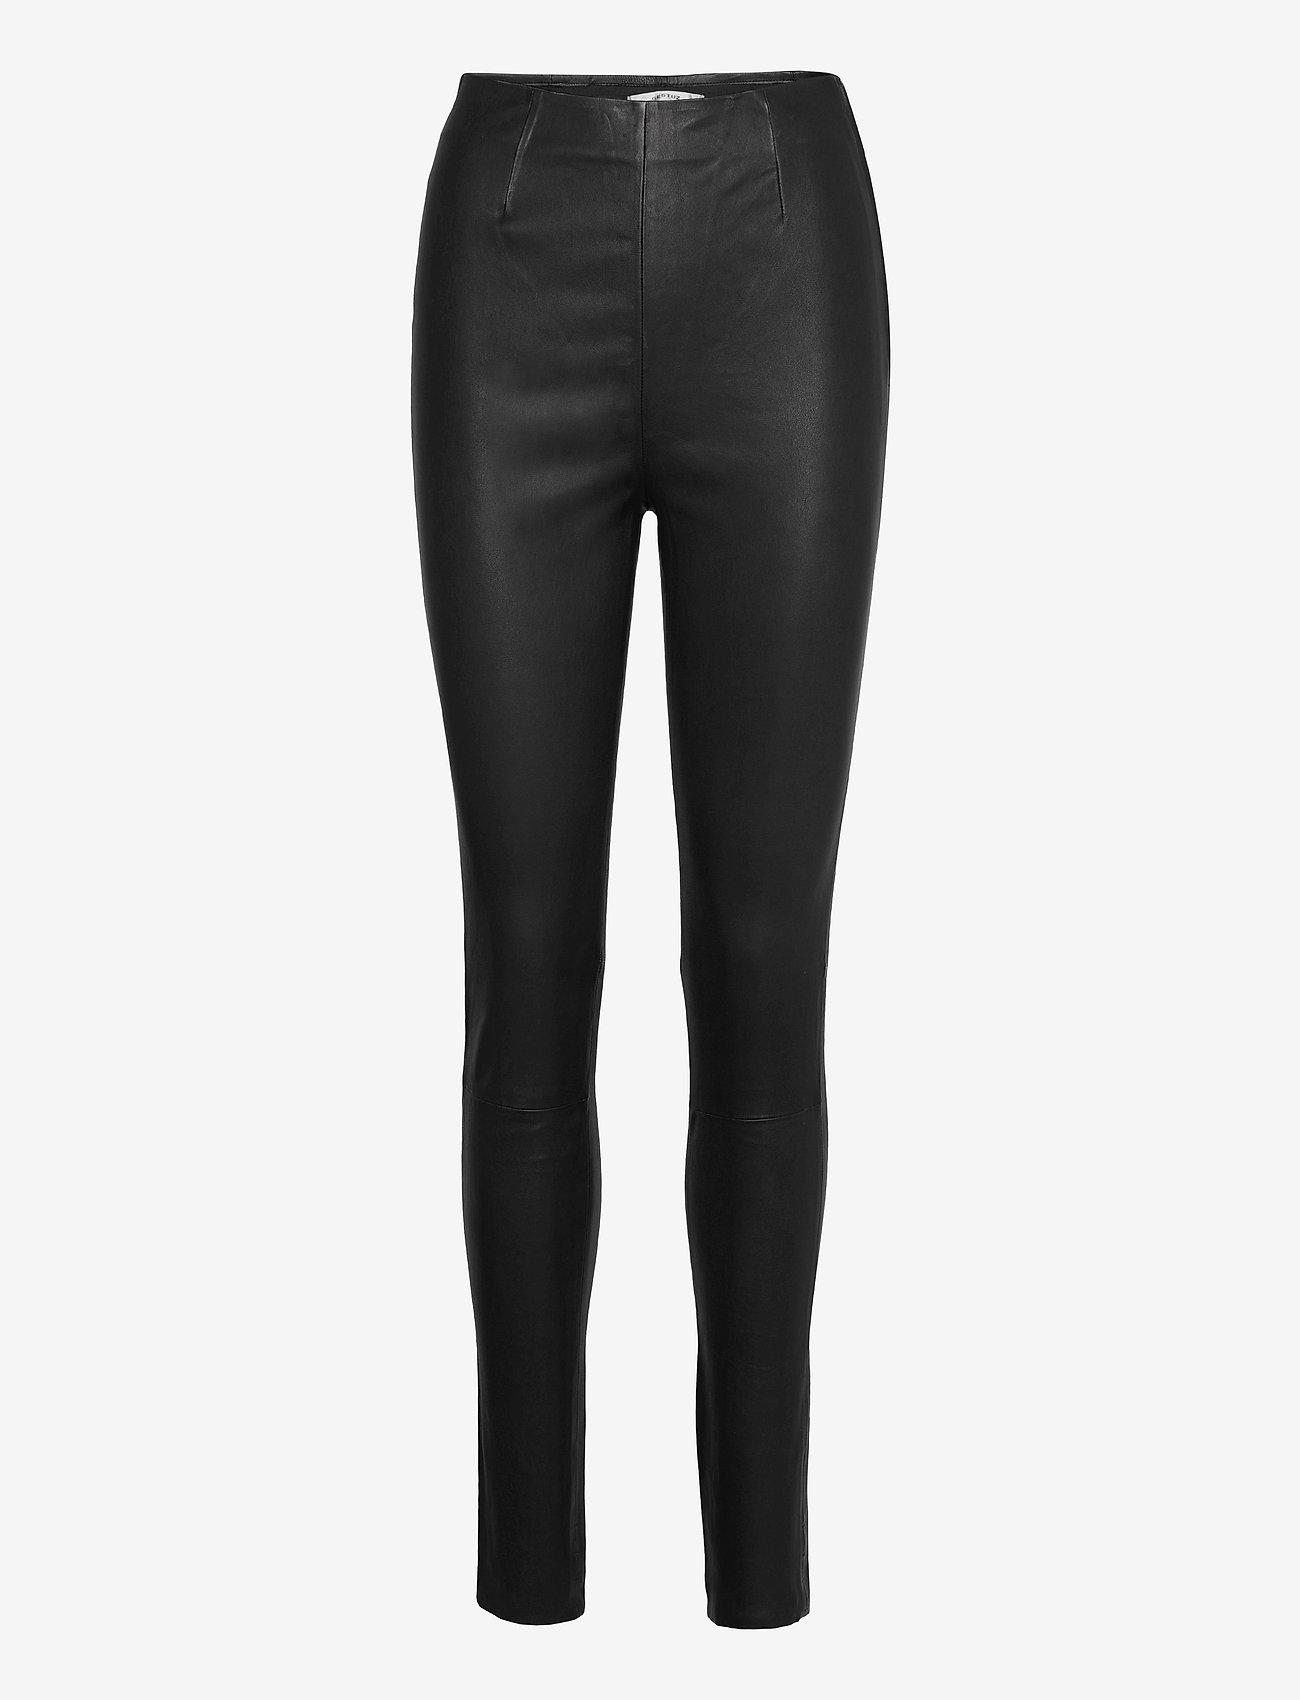 Gestuz - SashaGZ HW leather legging NOOS - læderbukser - black - 1